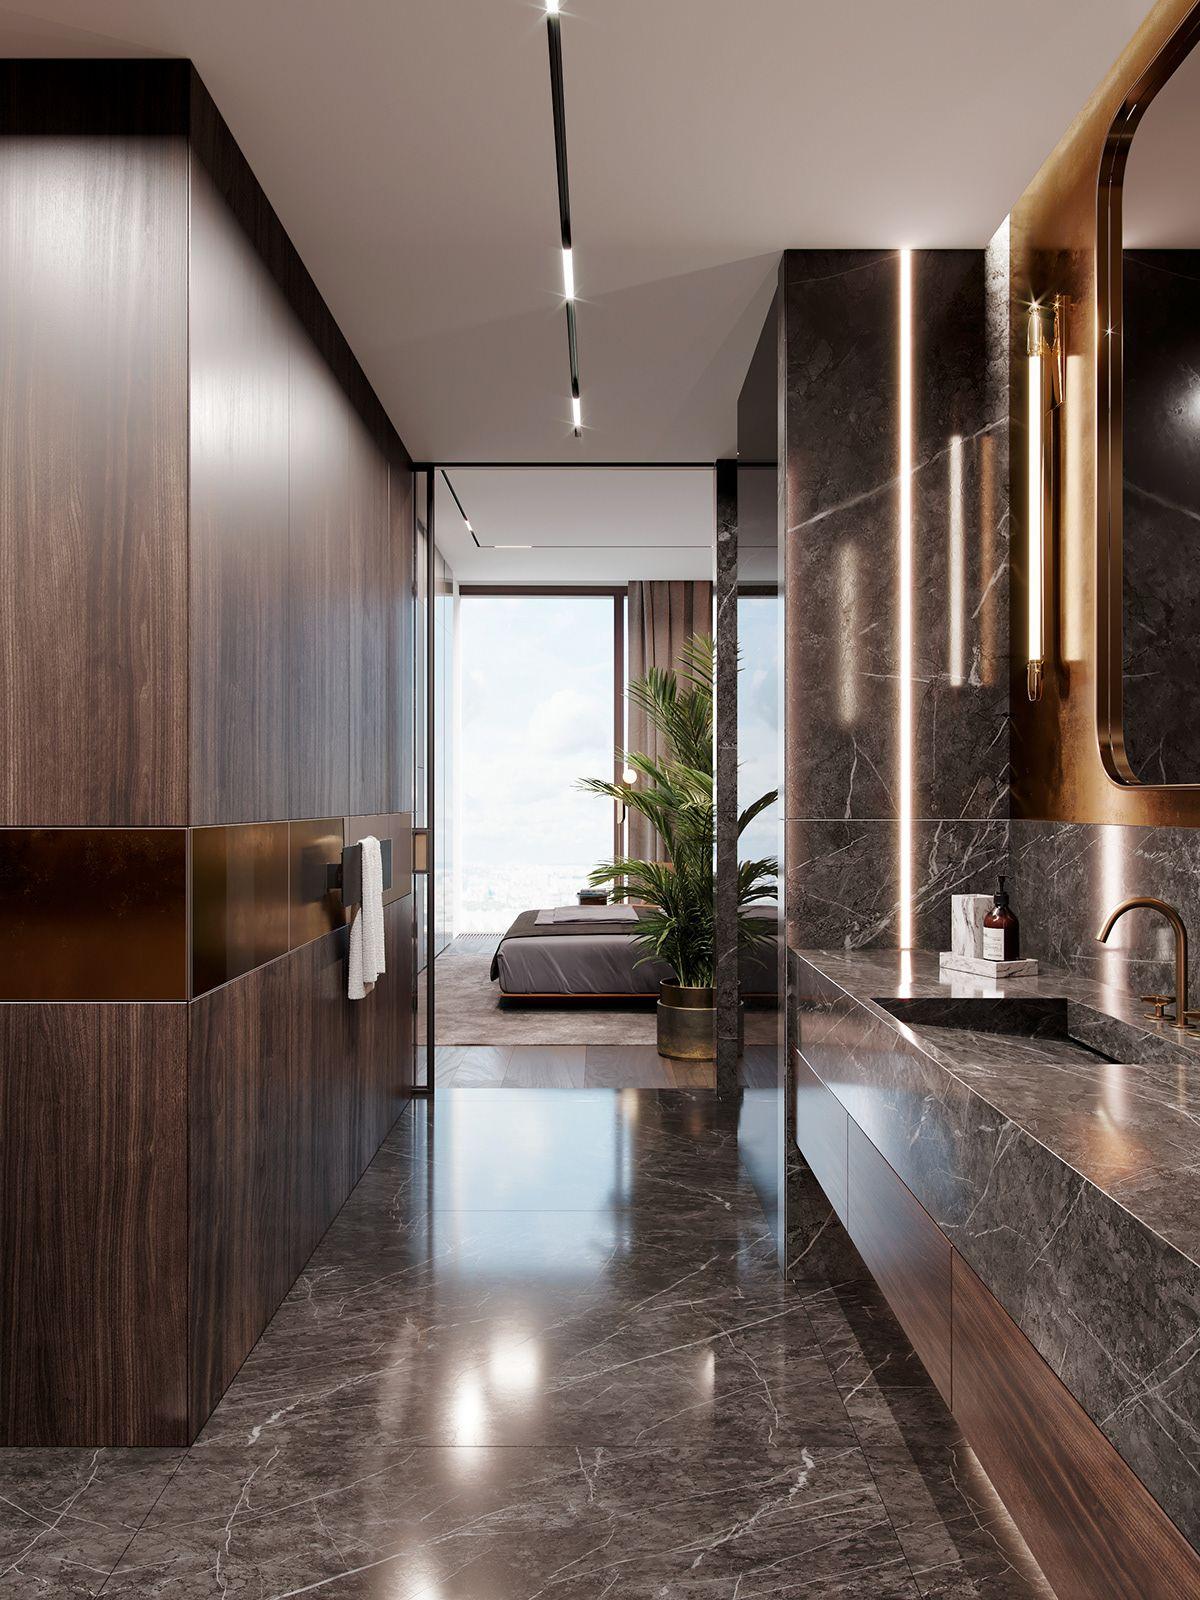 Federation tower moscow on behance also quartos interior design rh pinterest